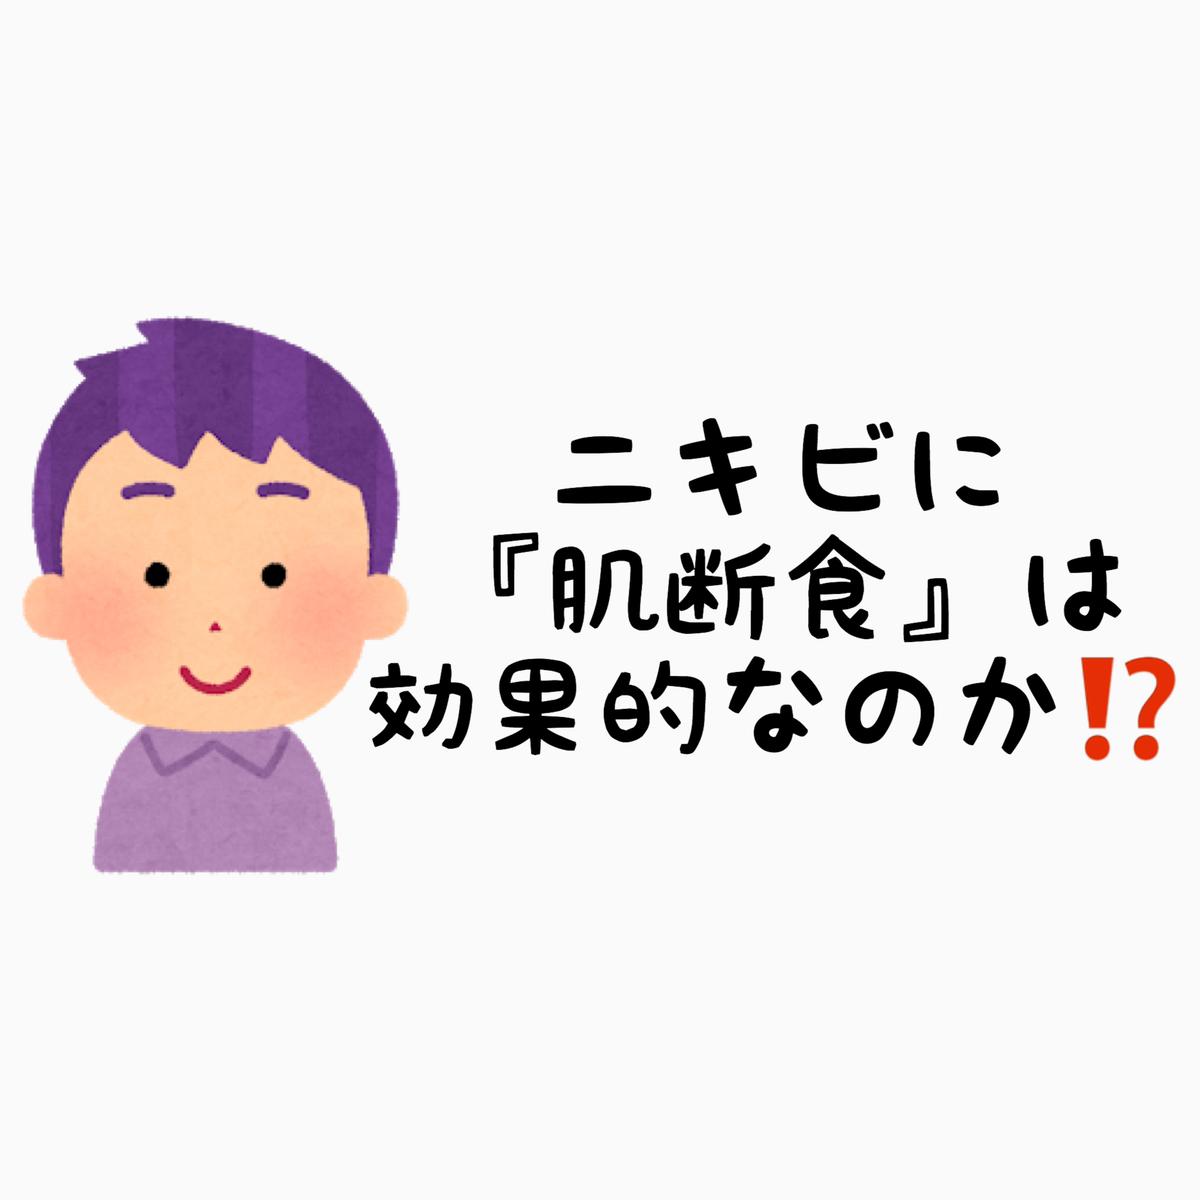 f:id:nokonoko_o:20200828165237j:plain